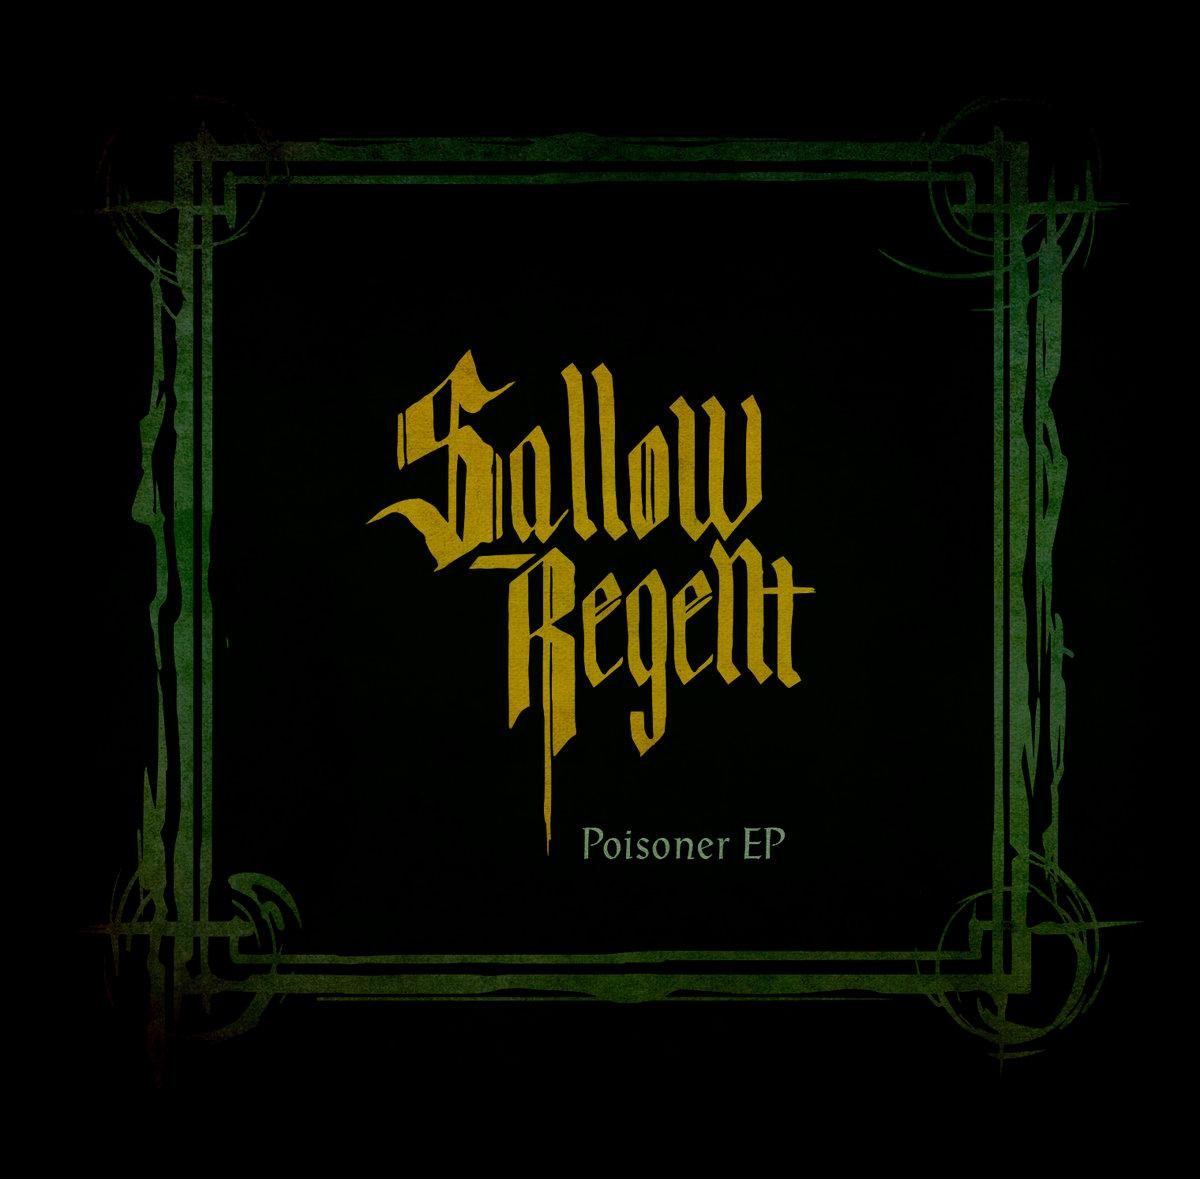 www.facebook.com/sallowregent